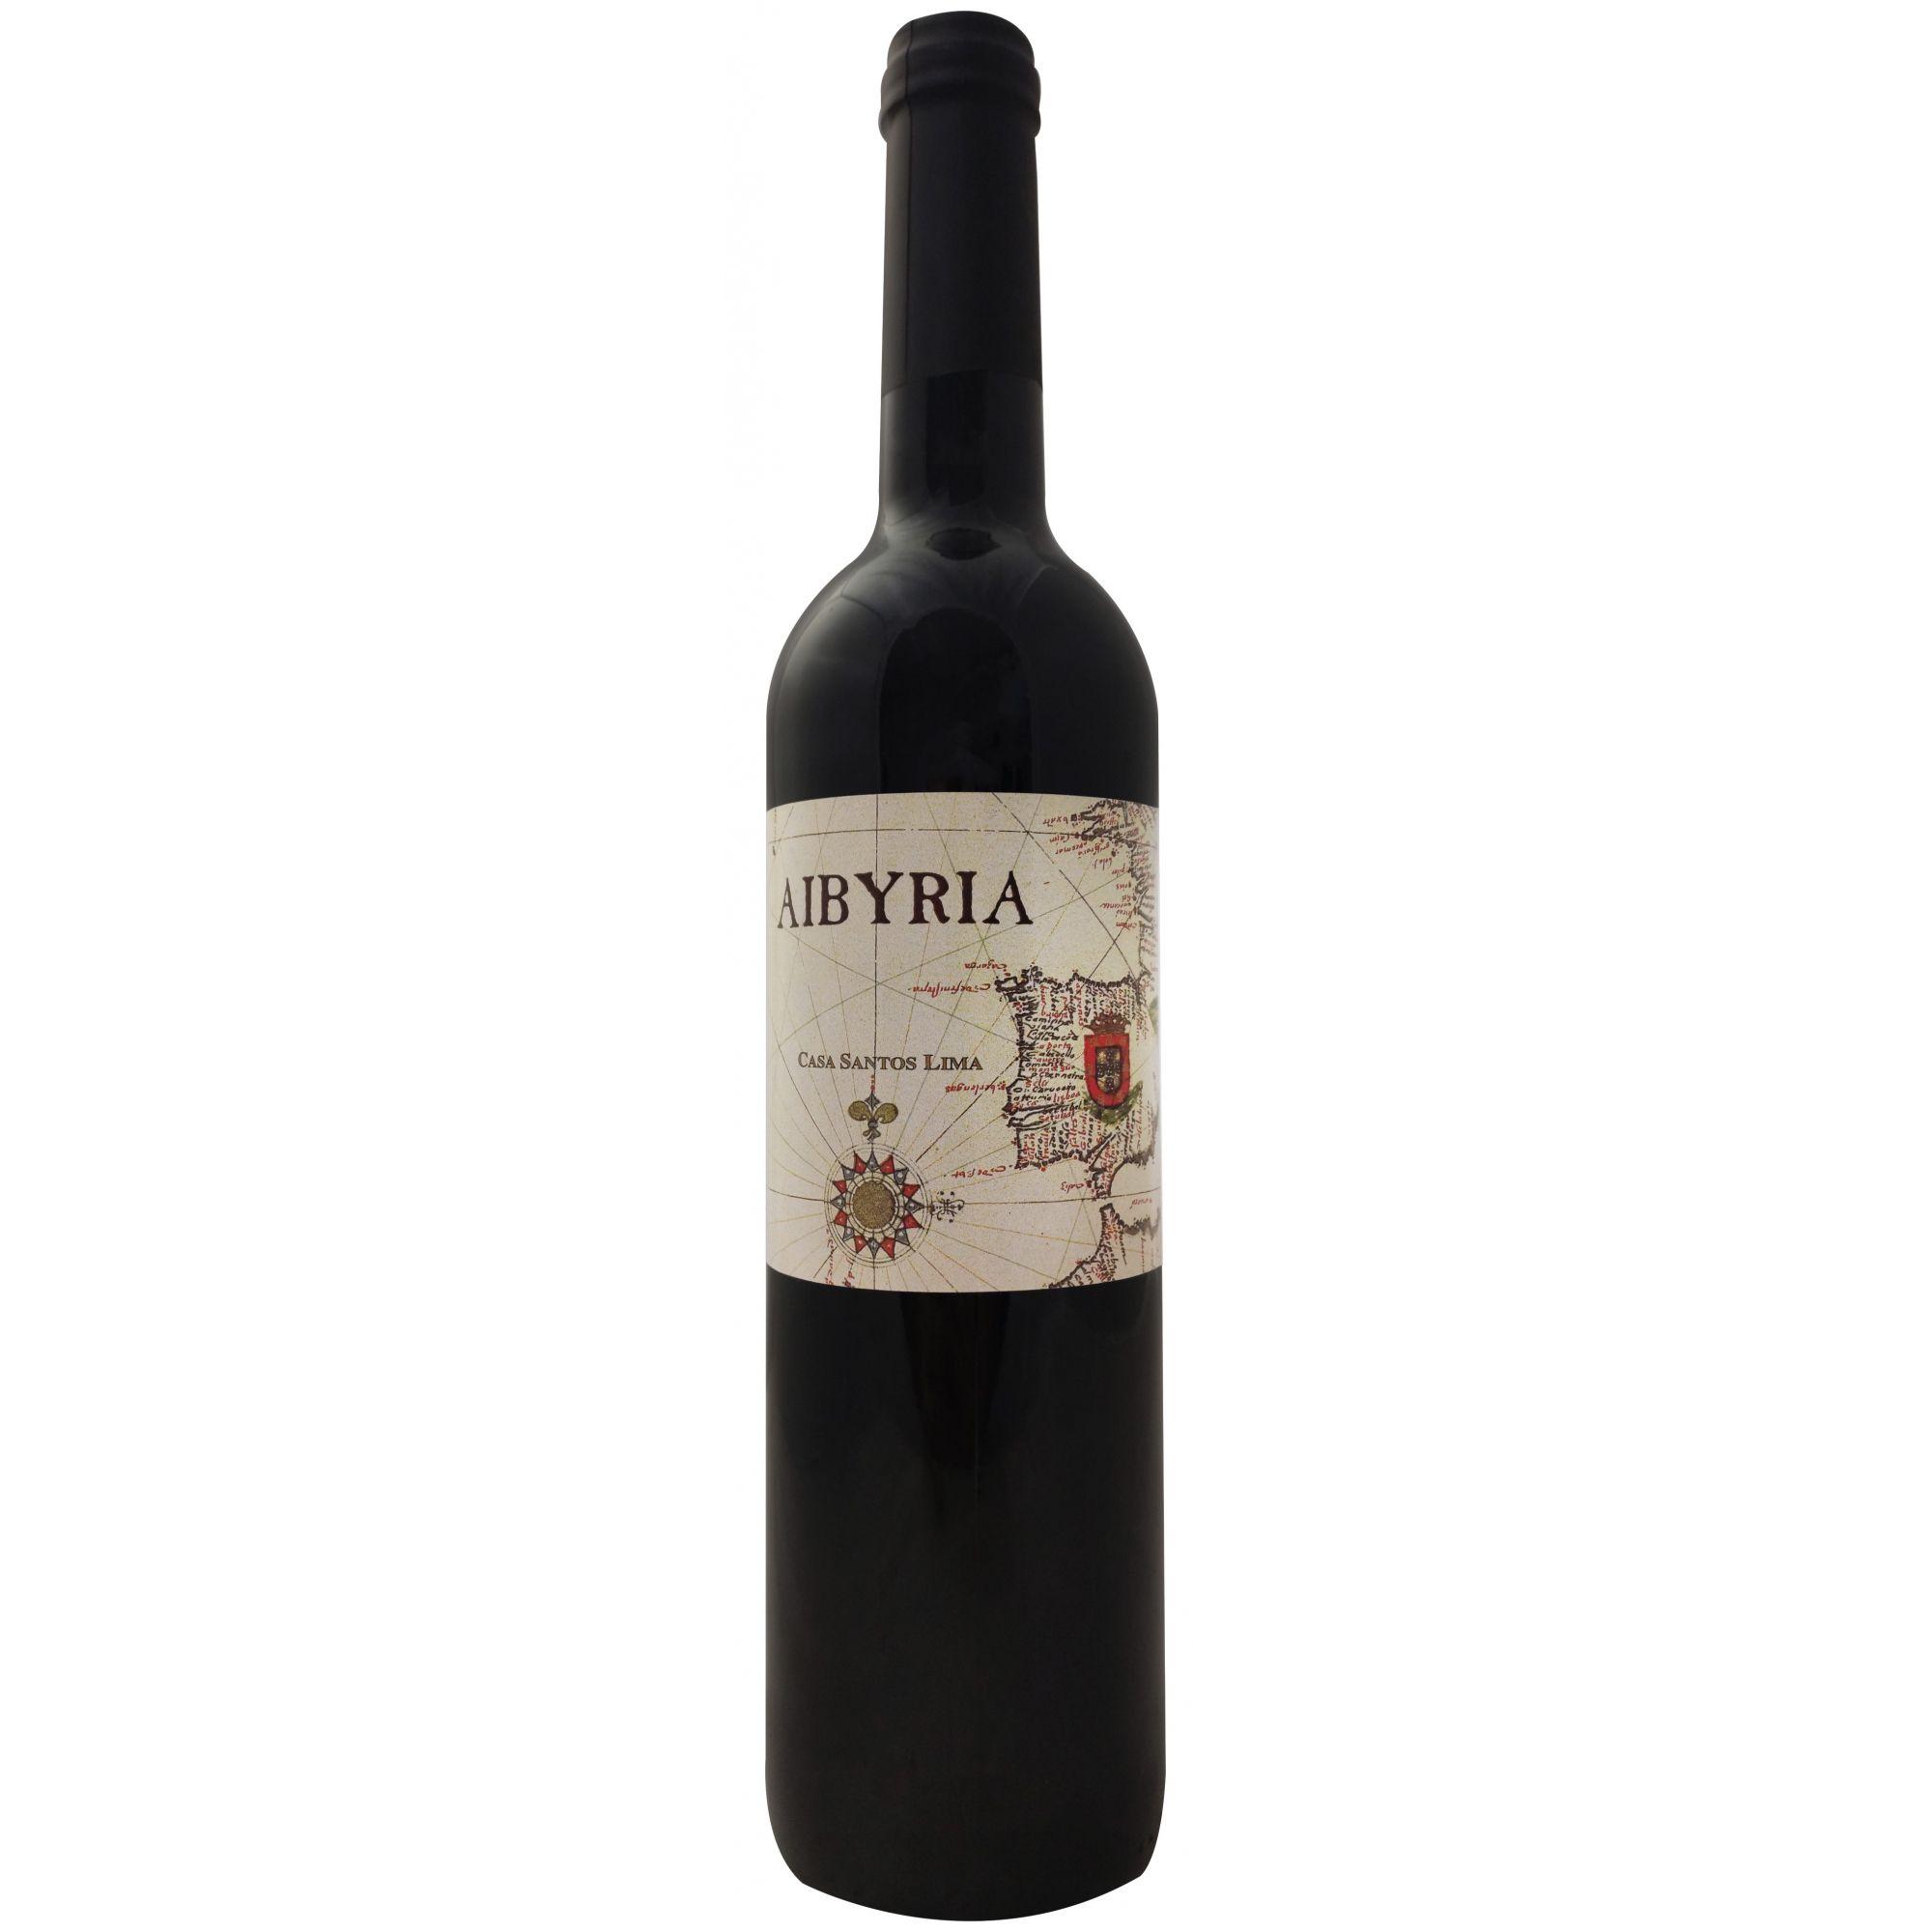 Vinho Tinto Aibyria Regional Lisboa